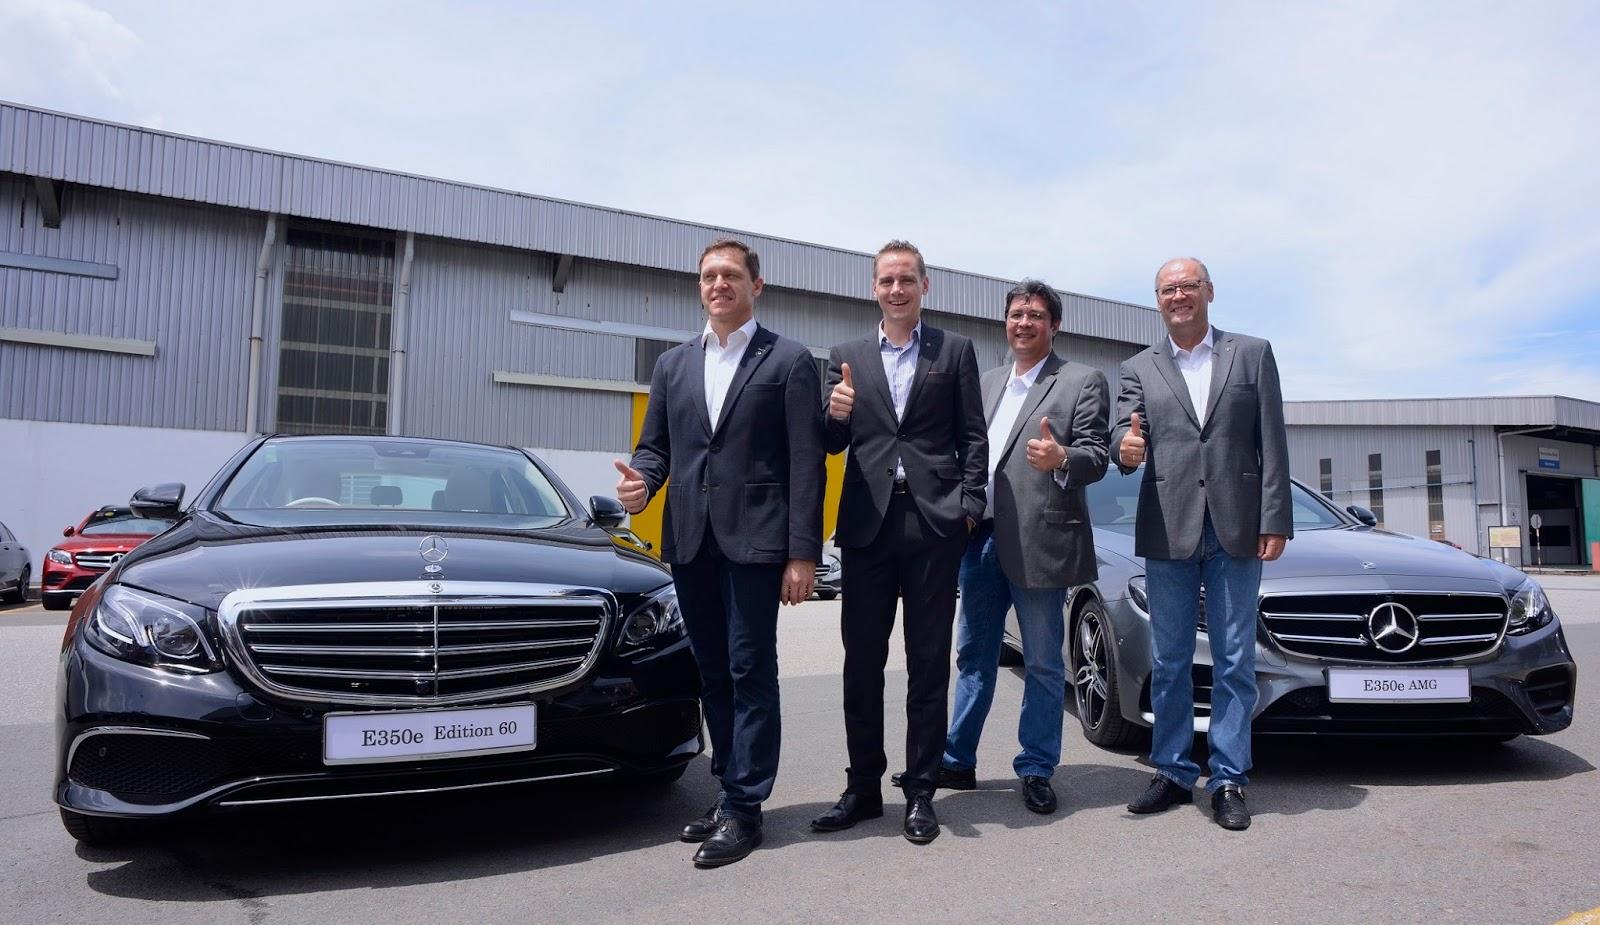 Mercedes 124 - 13 years on the conveyor